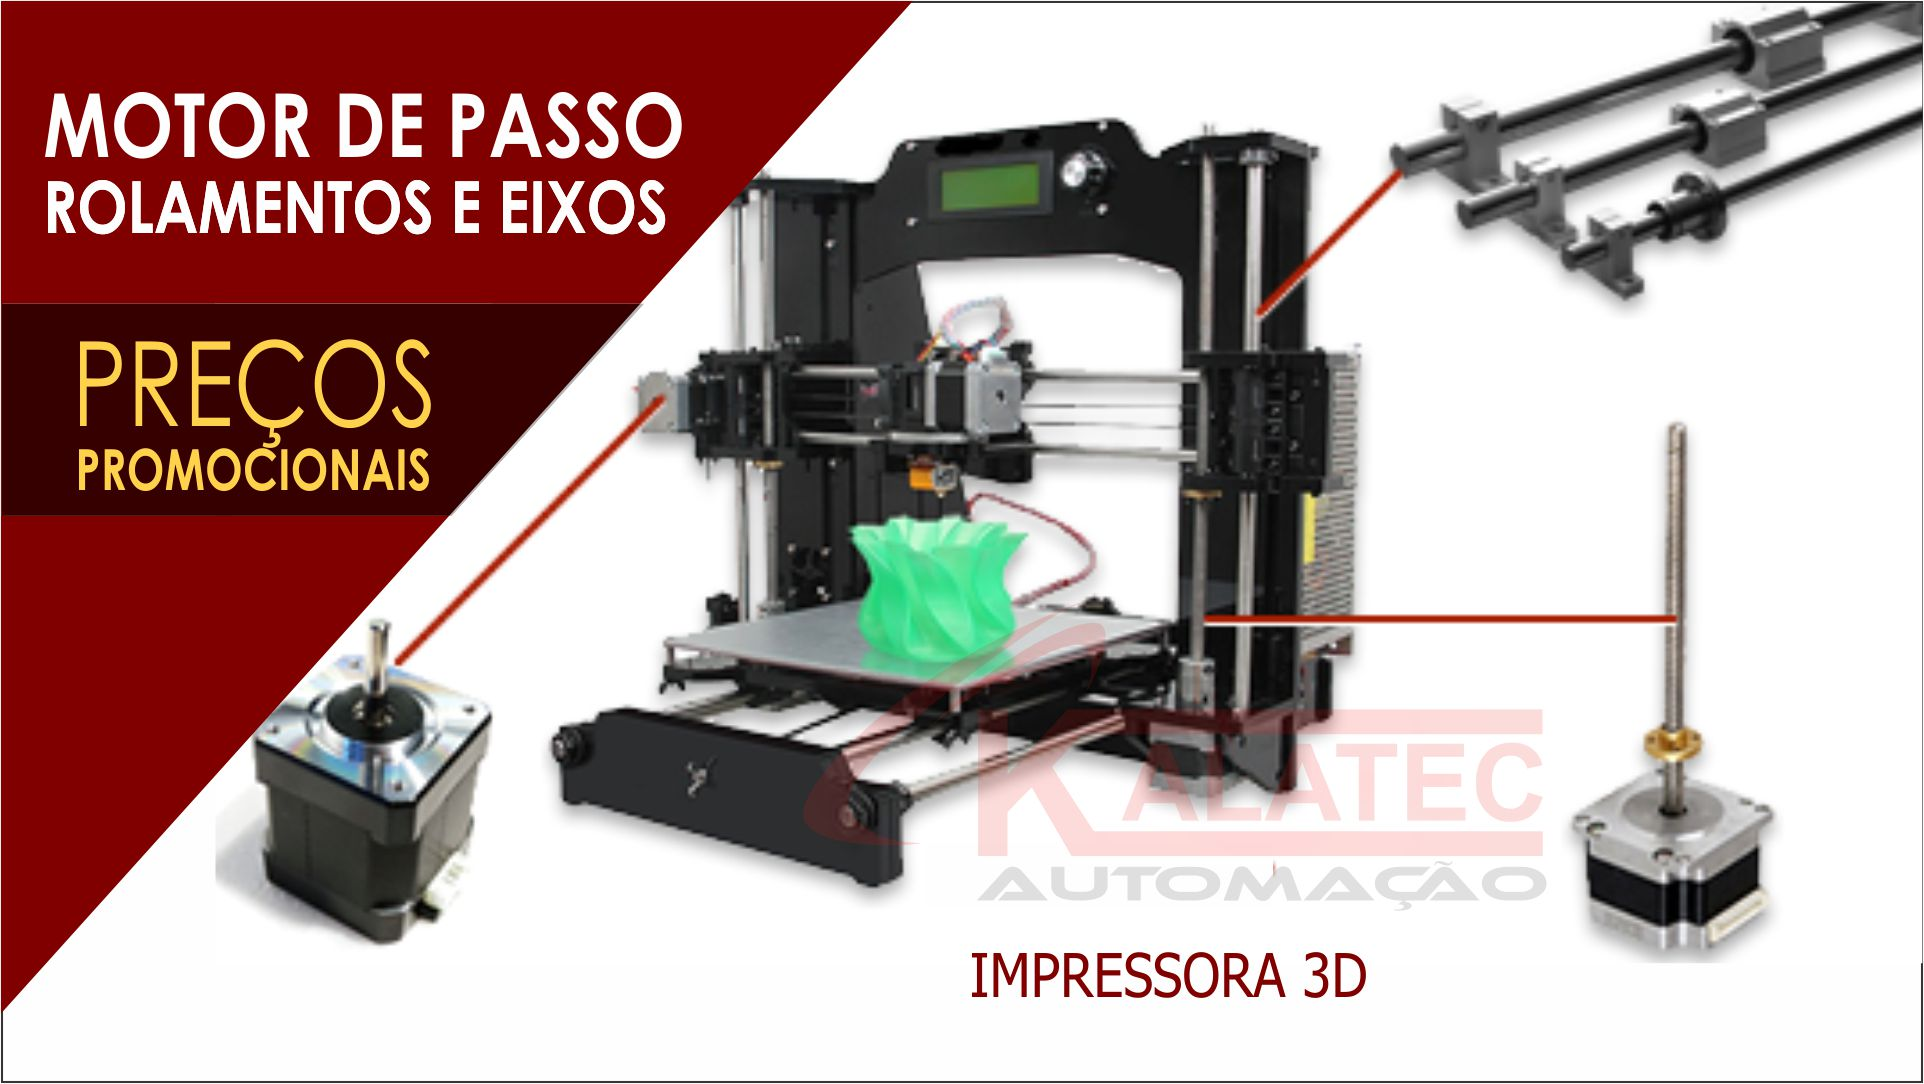 Imagem: 2019/09/Impressora-3D.jpg